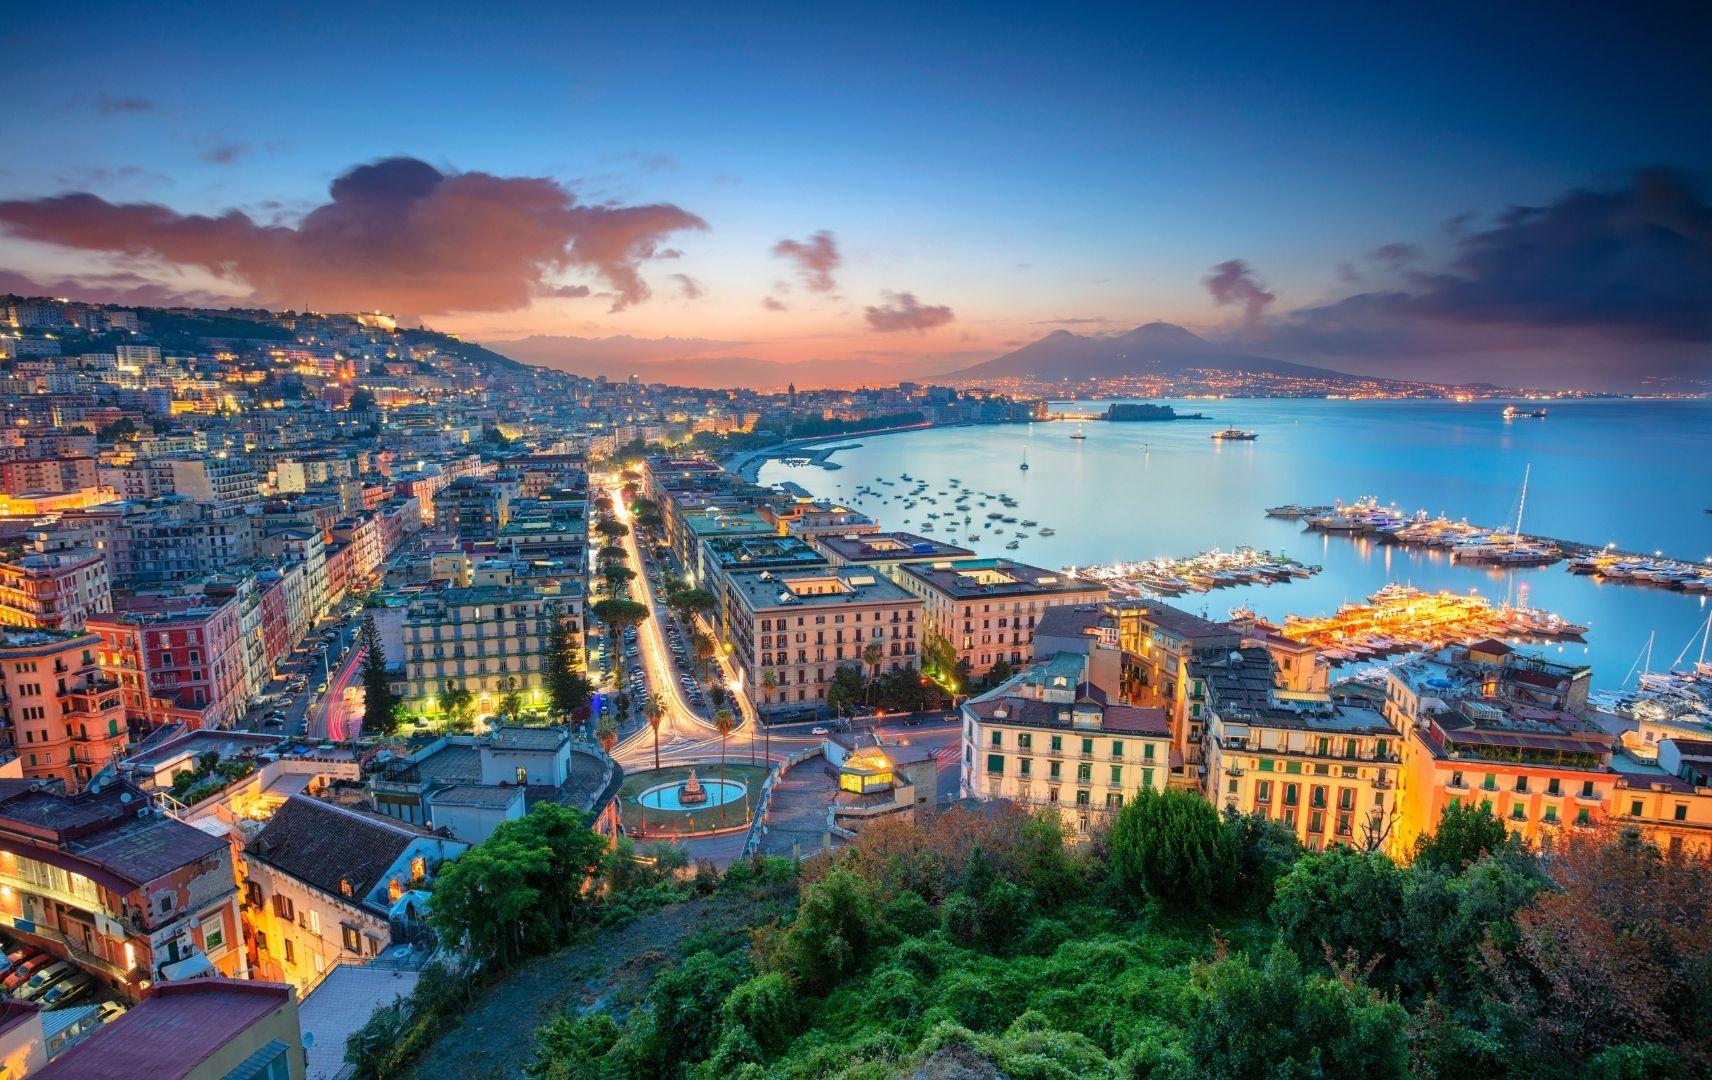 Hafen Neapel Italien